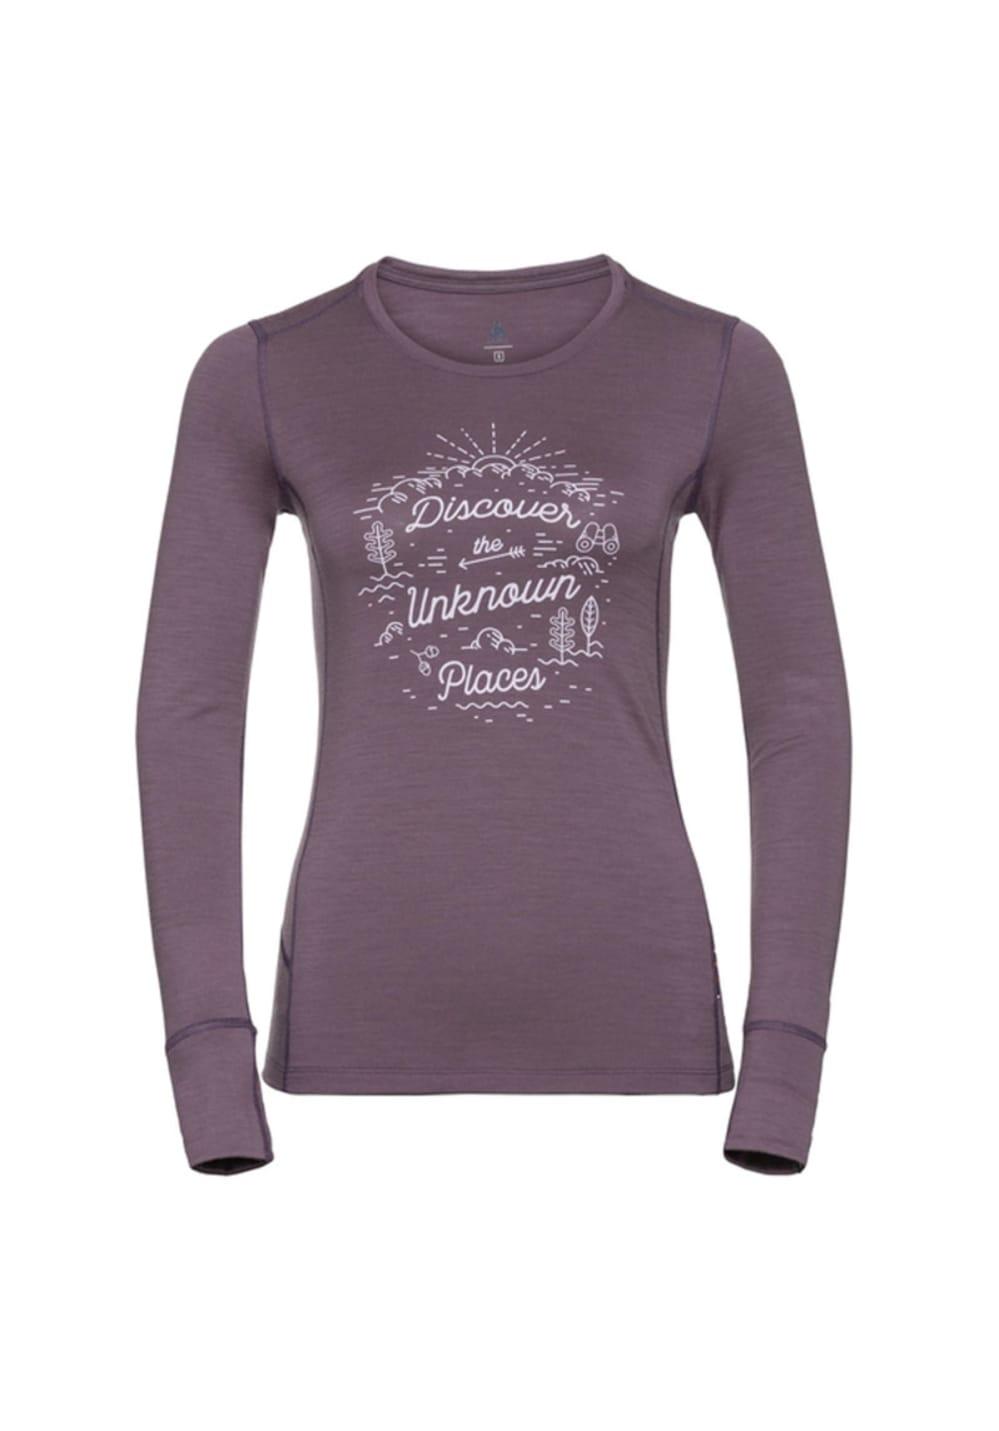 Odlo Top Crew Neck Long Sleeve Alliance - Laufshirts für Damen - Lila